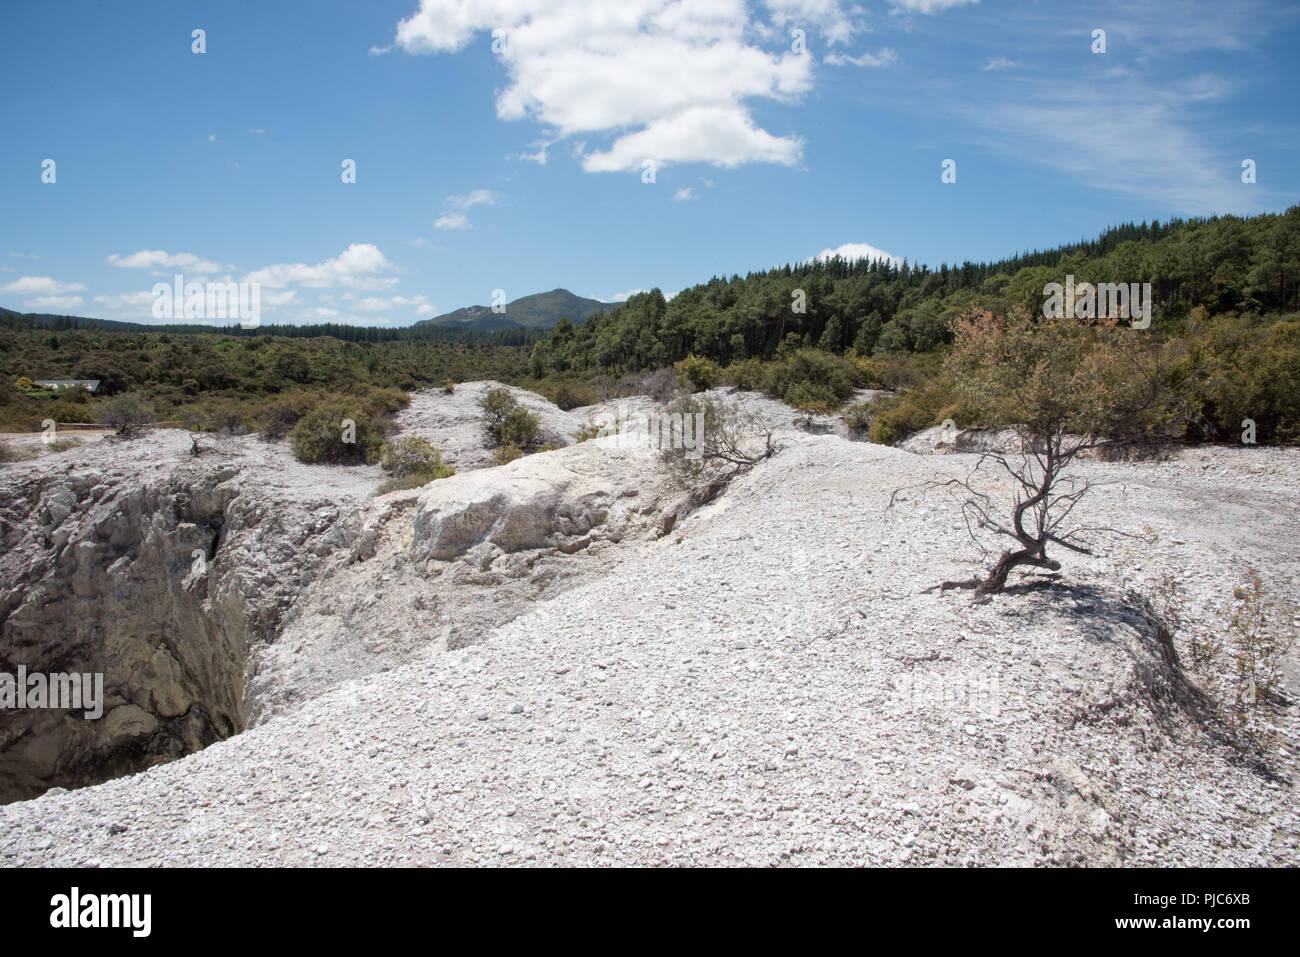 Rugged terrain and lush greenery at the Wai-o-Tapu geothermal area in Rotorua, New Zealand - Stock Image